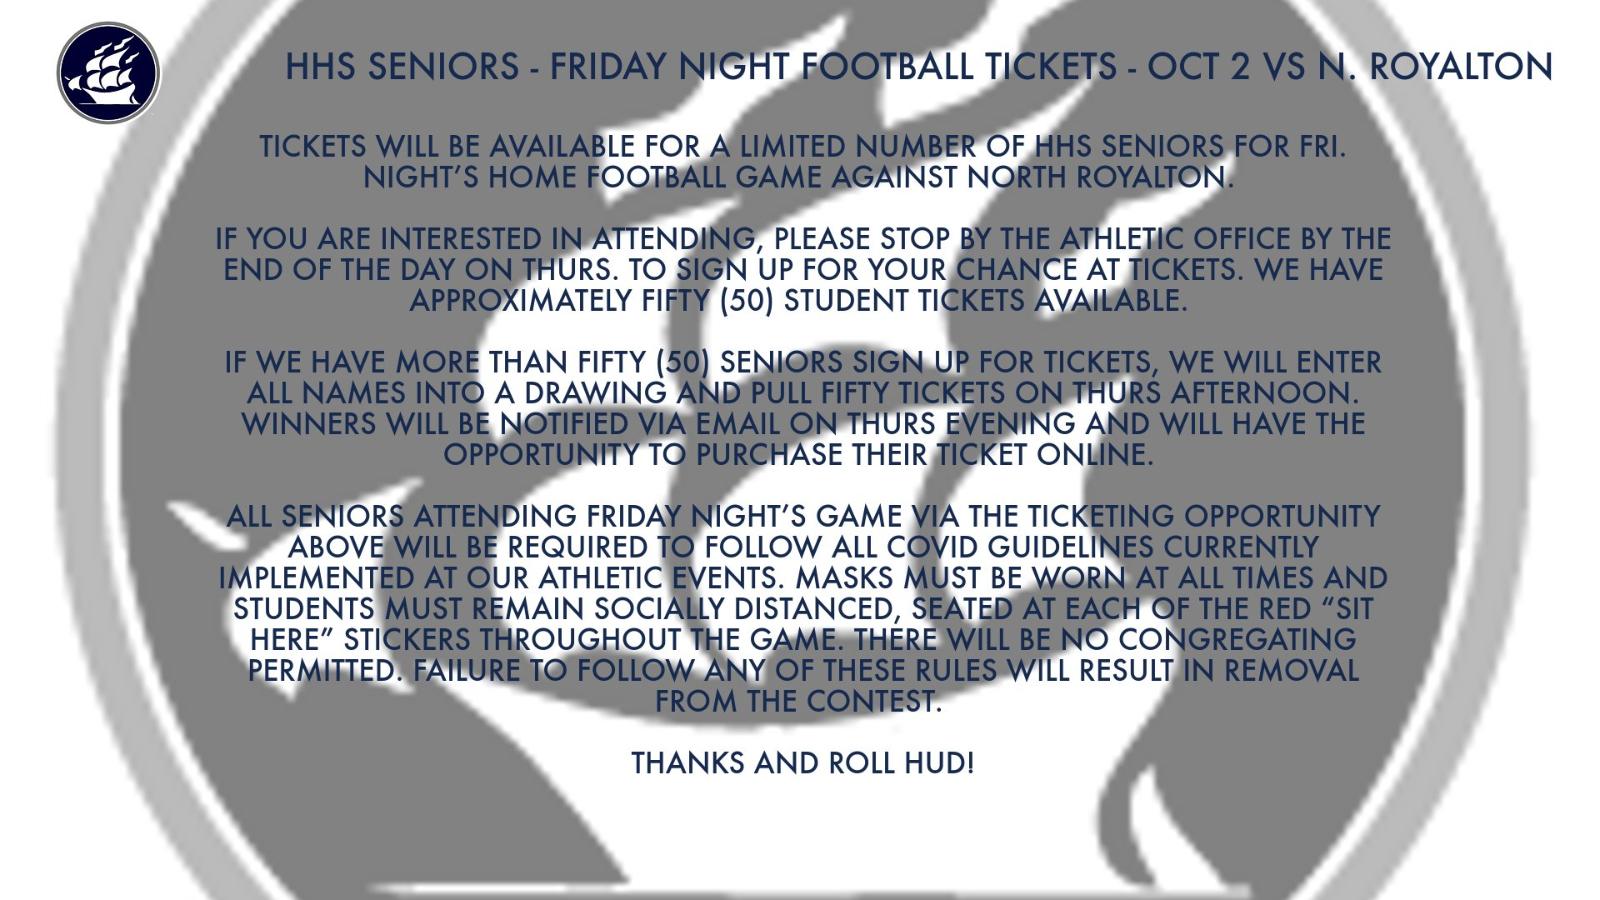 HHS Seniors – Student Football Tickets